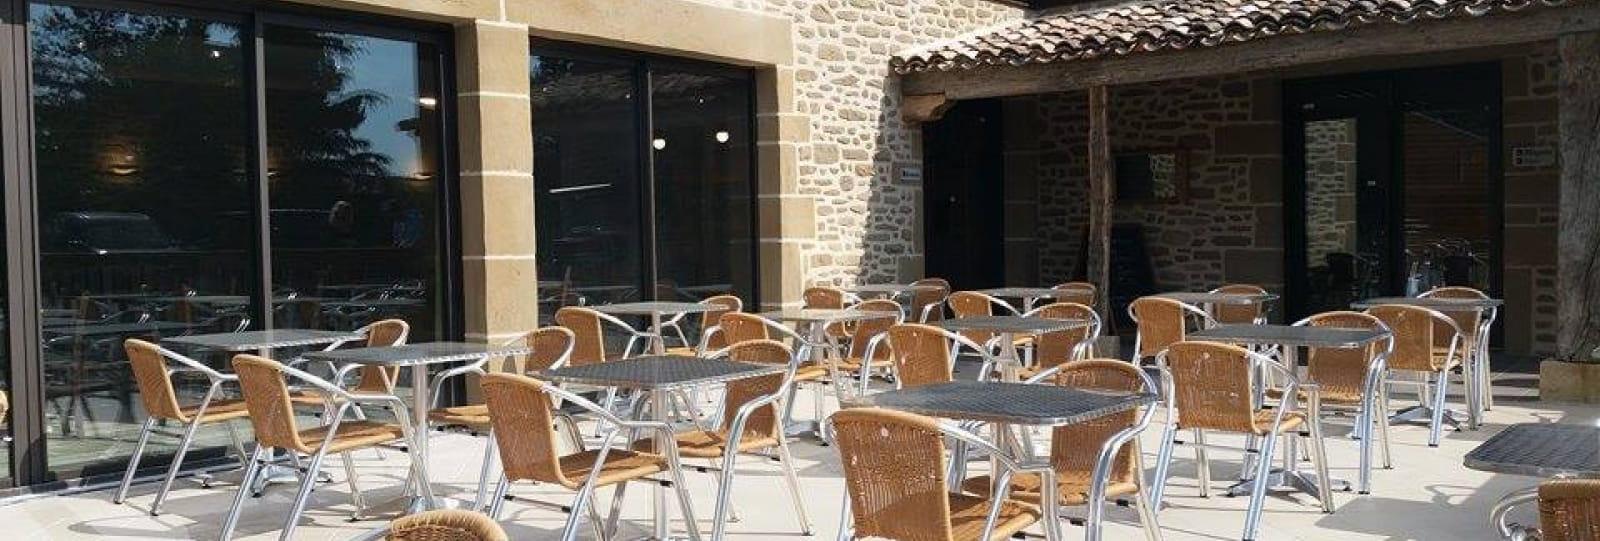 Restaurant Bancel